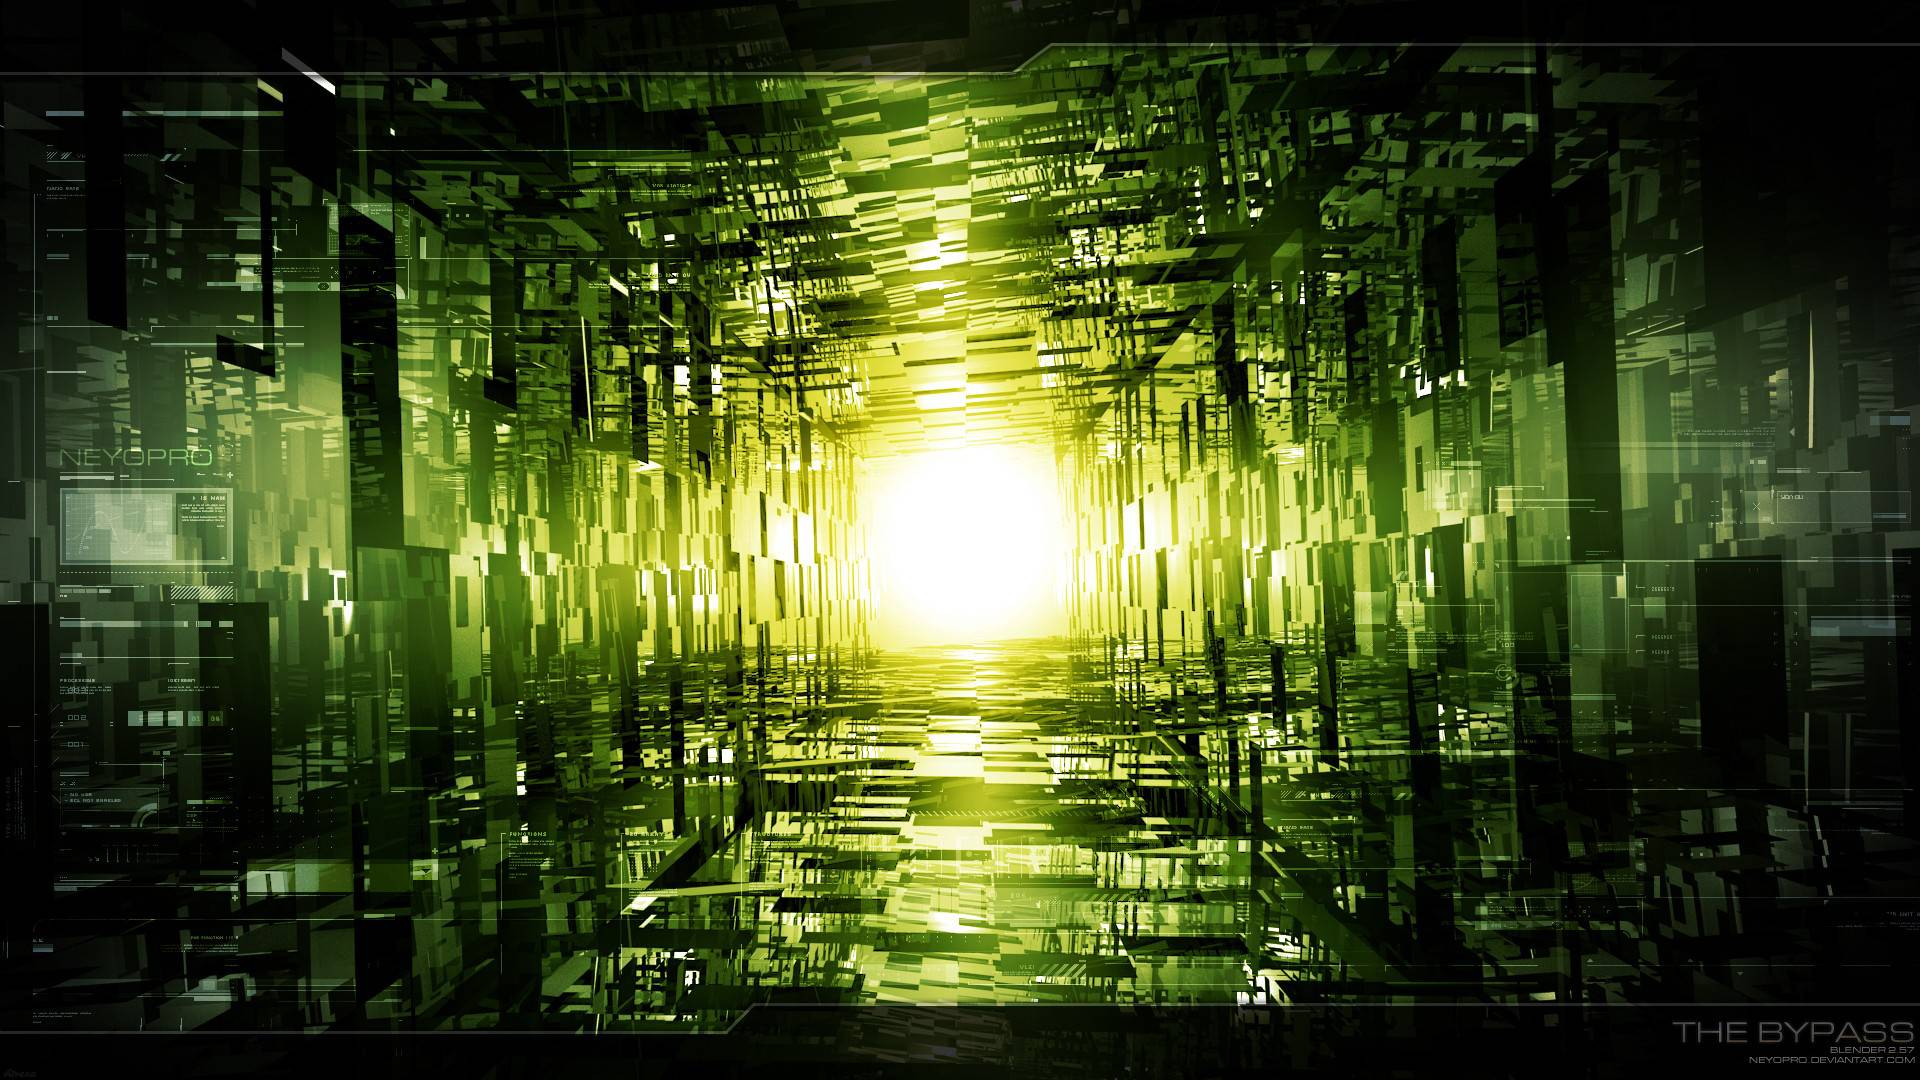 Green abstract wallpaper HQ WALLPAPER - (#9997)